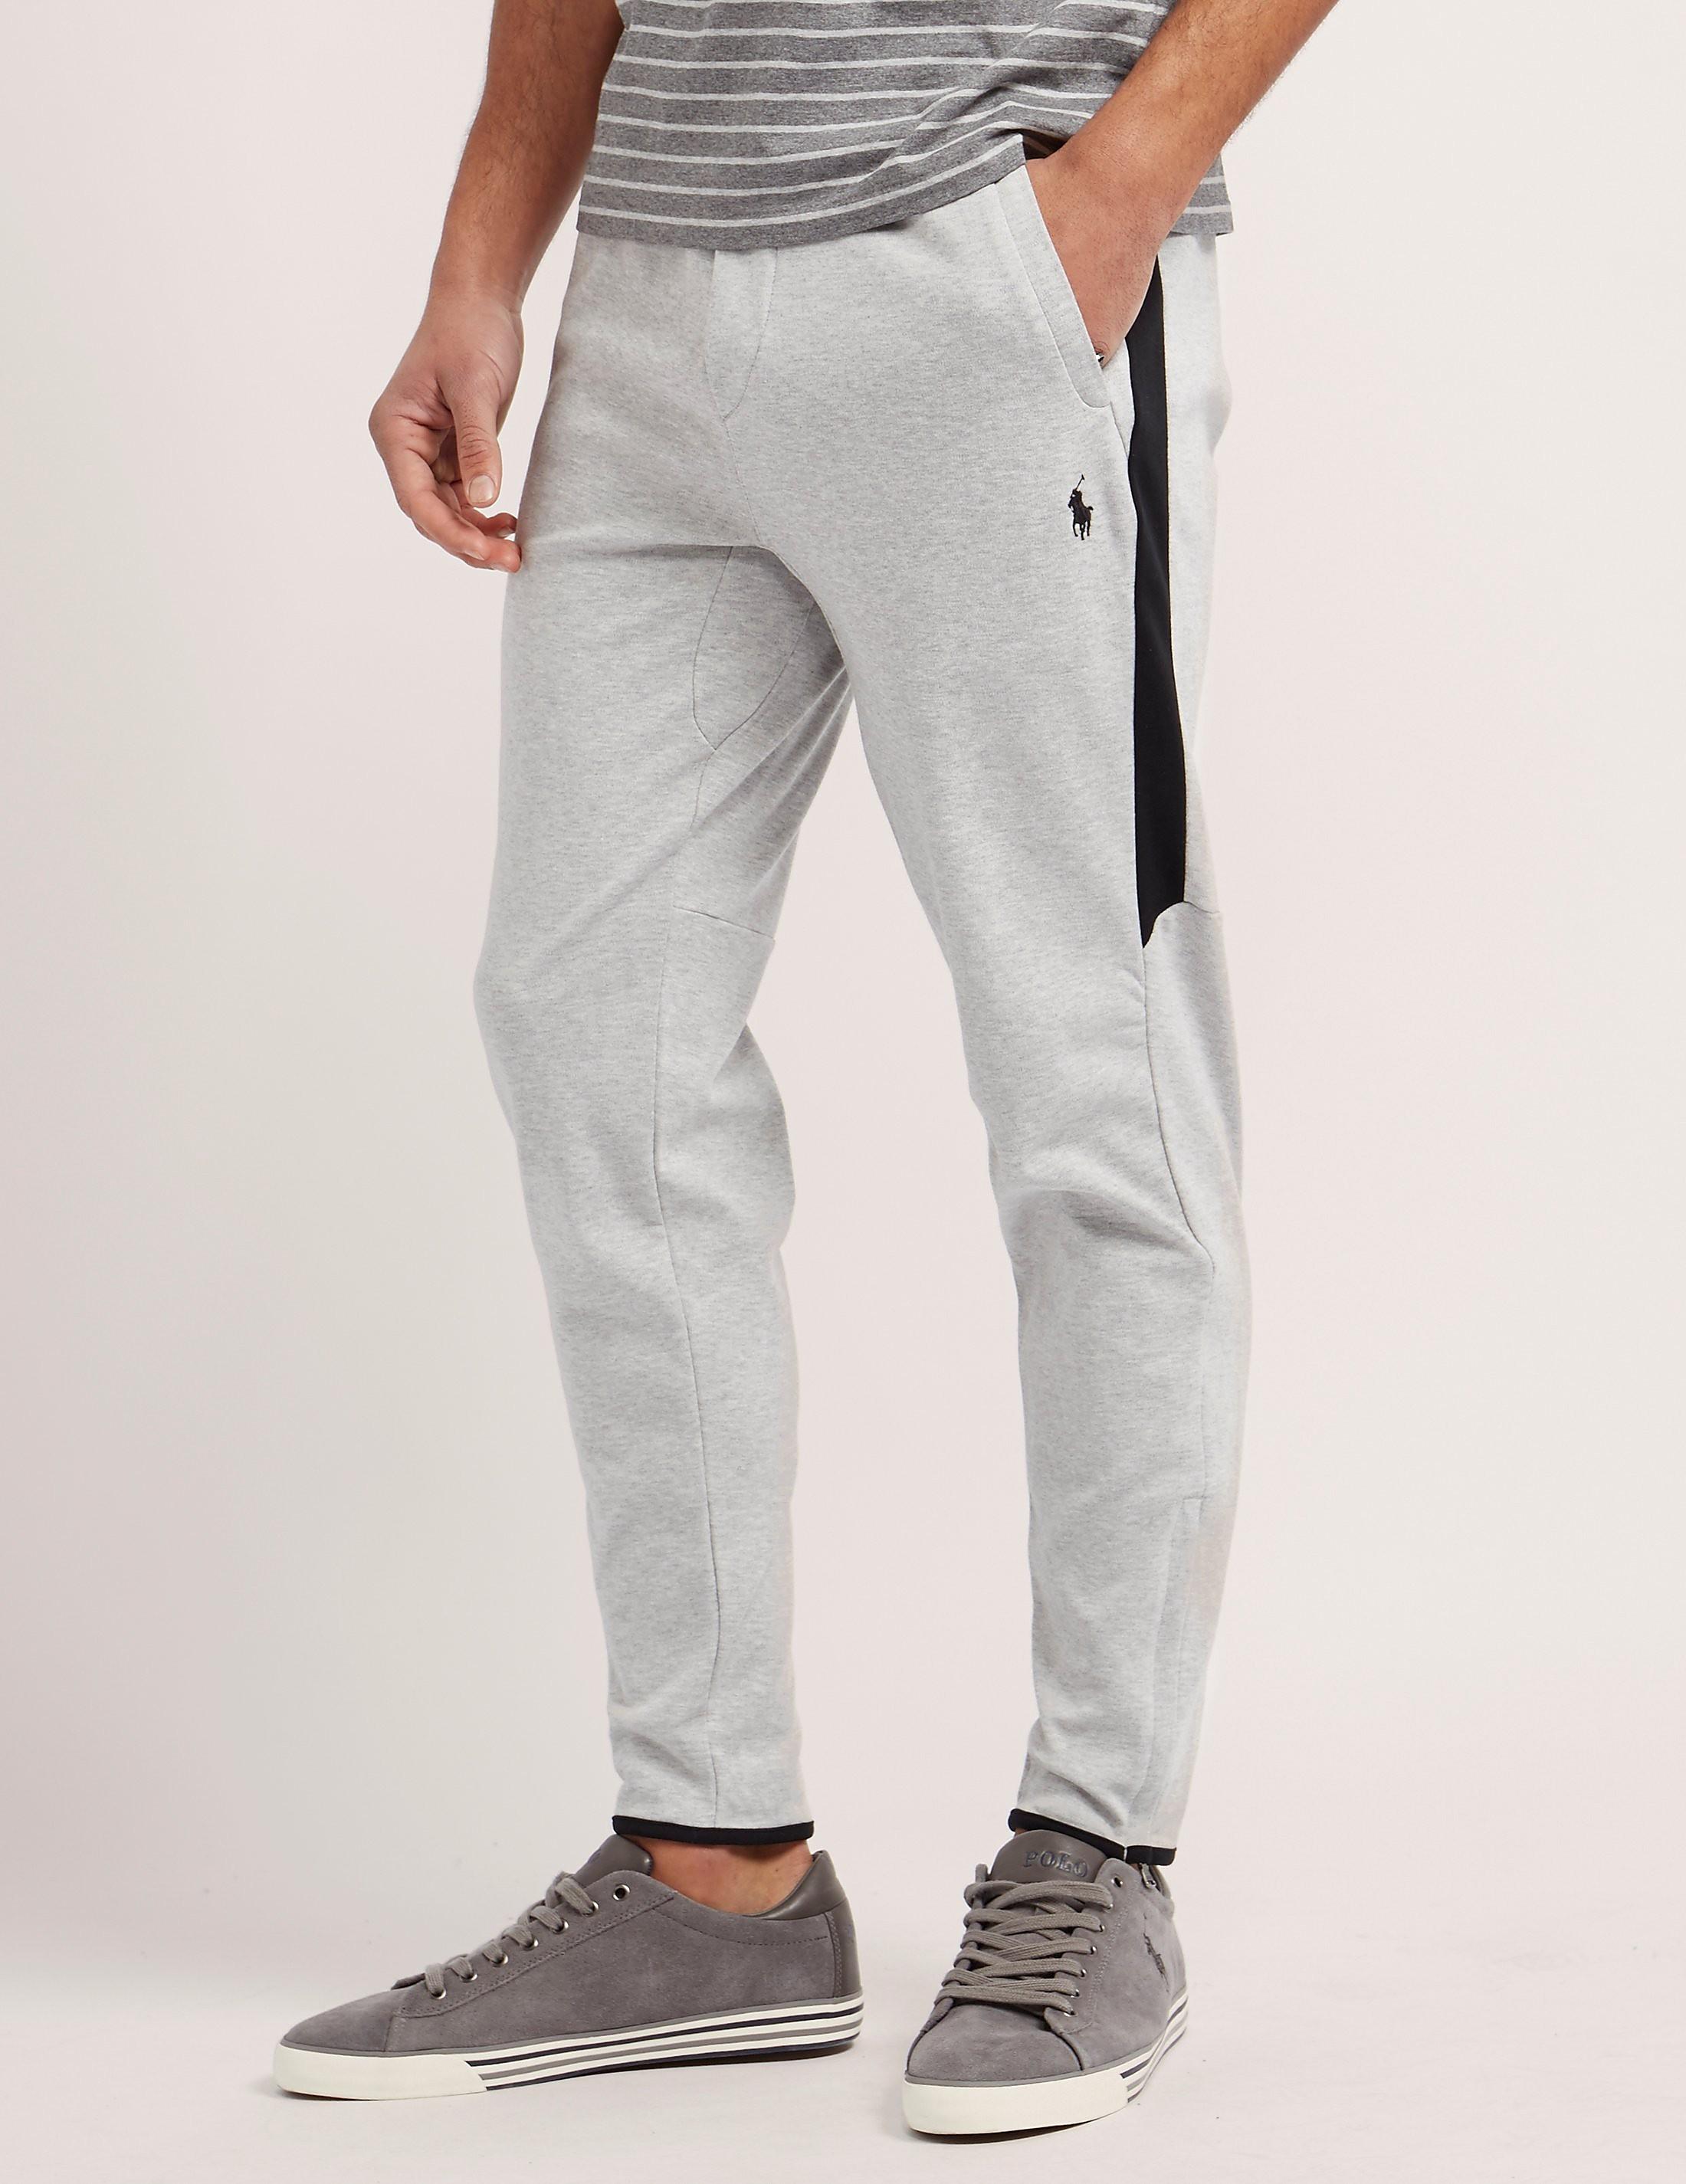 Polo Ralph Lauren Cuffed Sweatpants